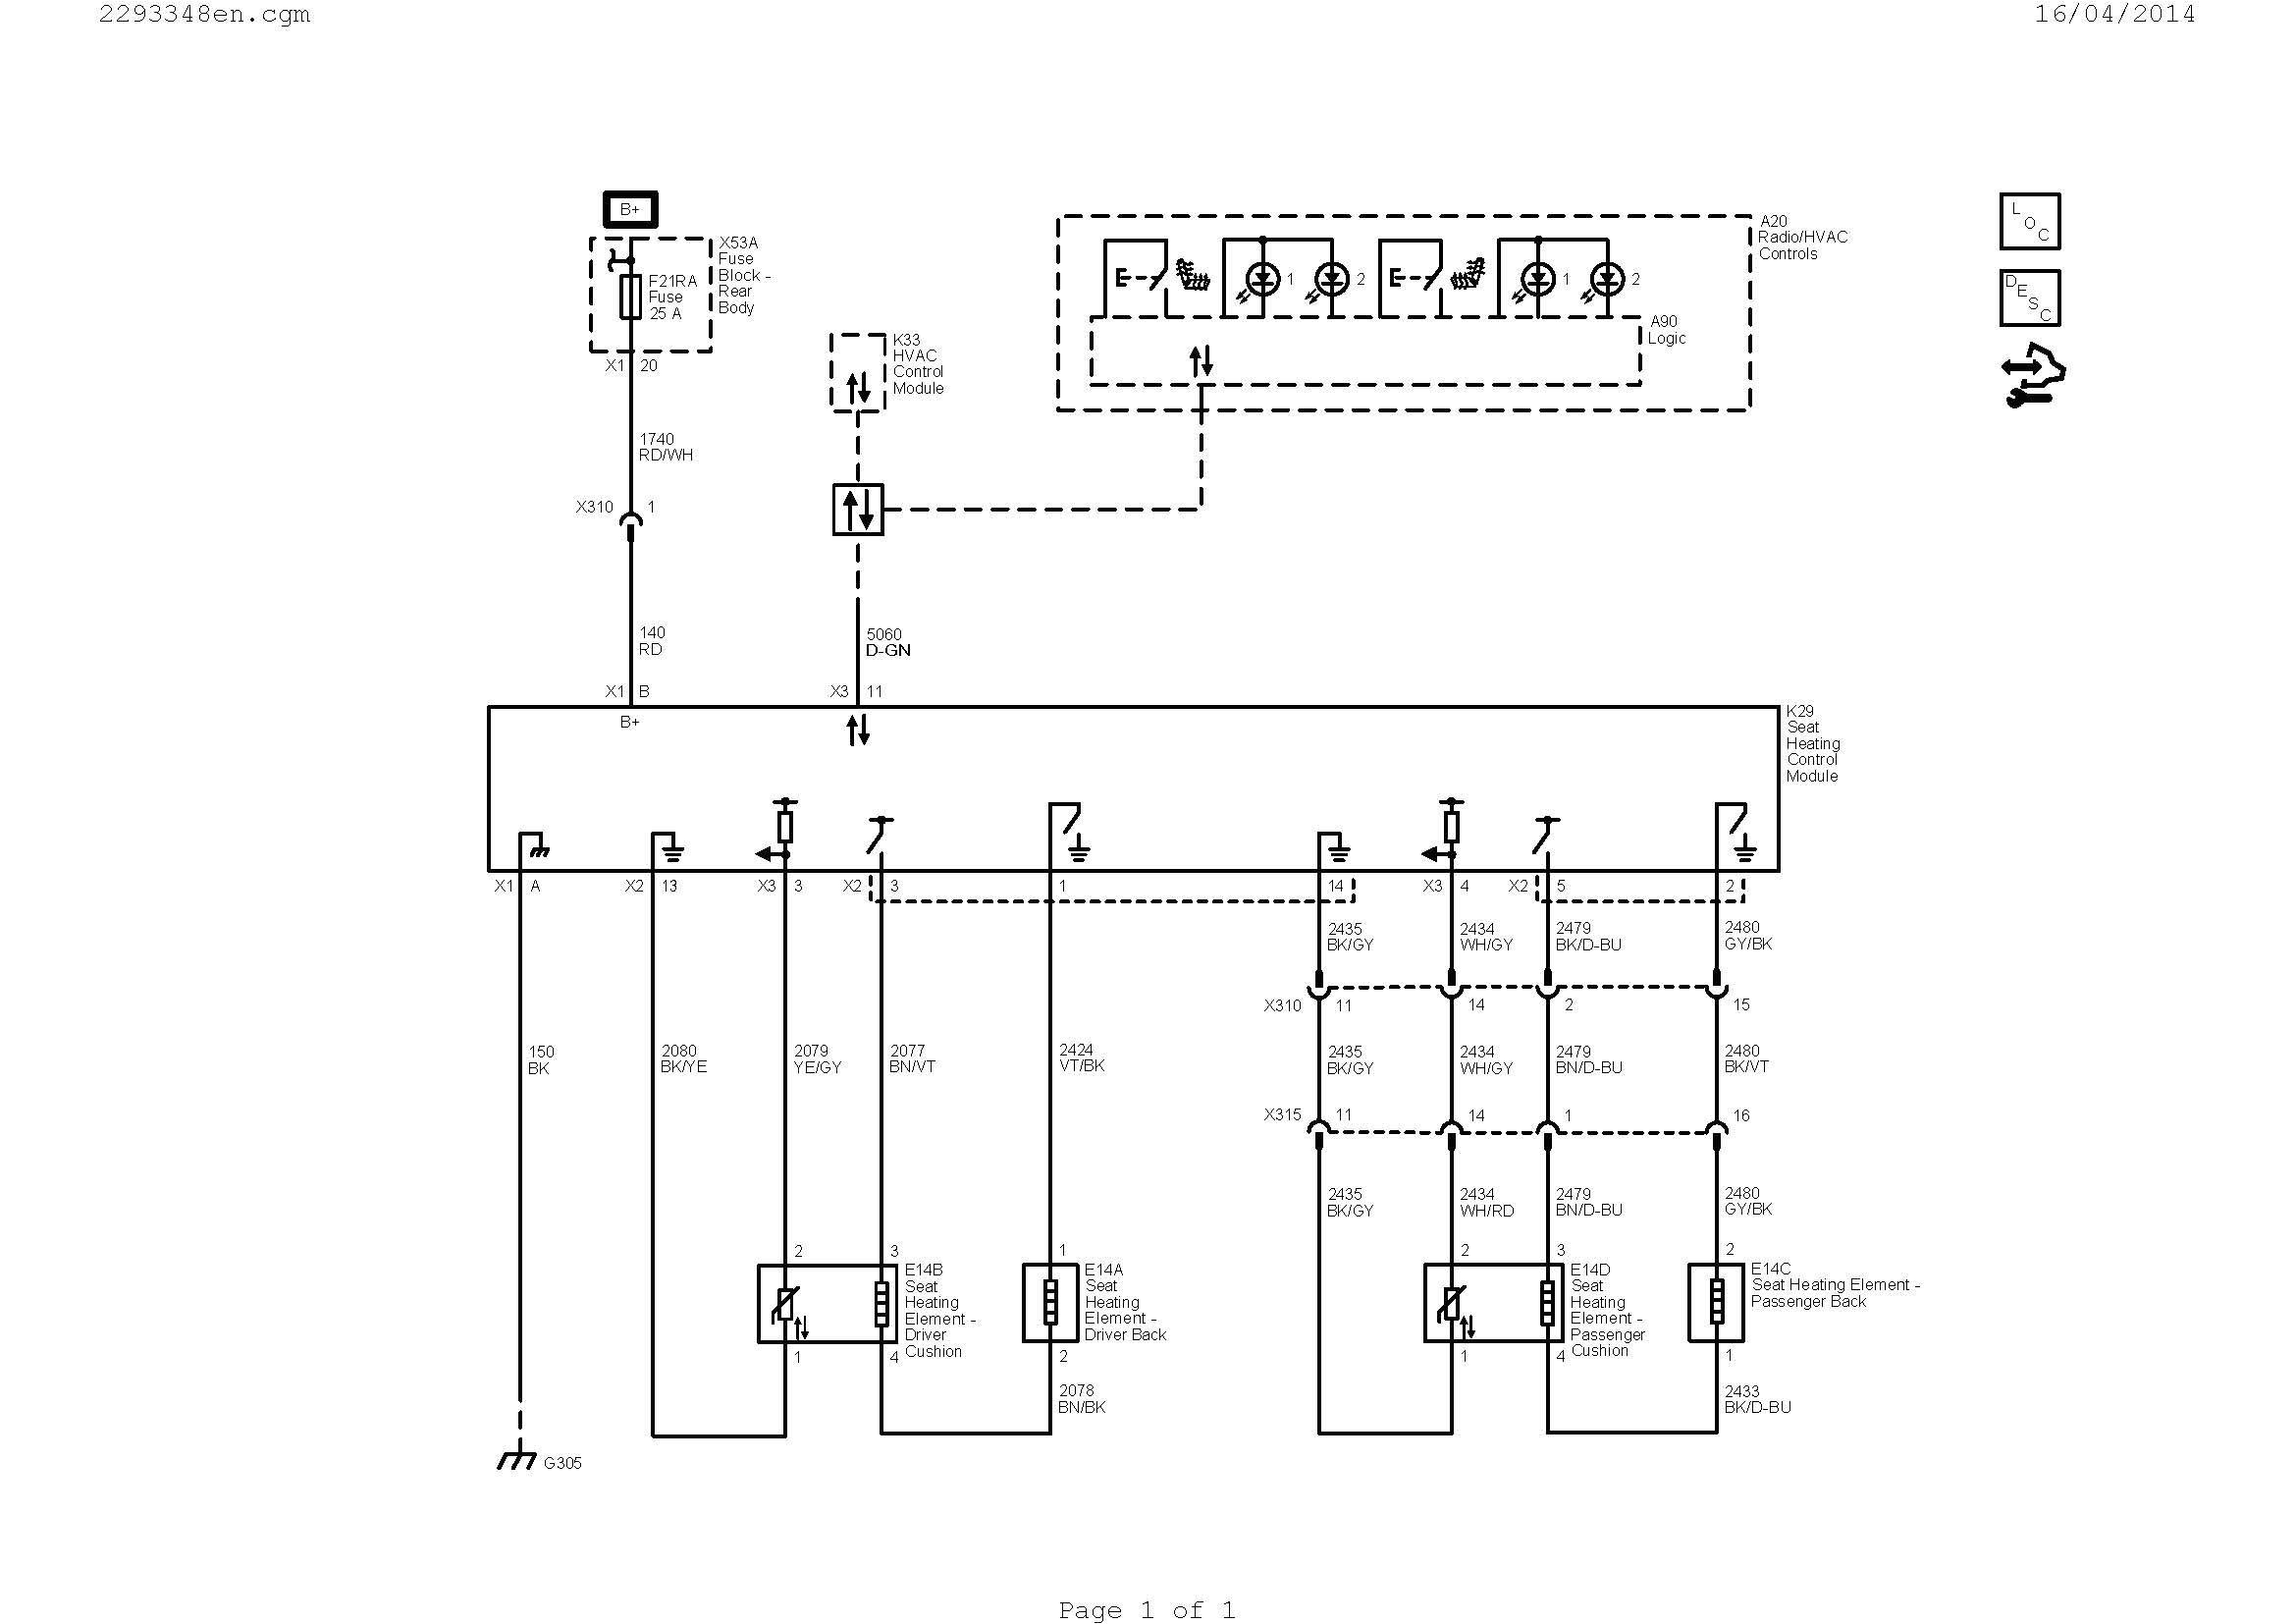 car ac compressor diagram new wiring diagram car ac eugrab of car ac compressor diagram jpg